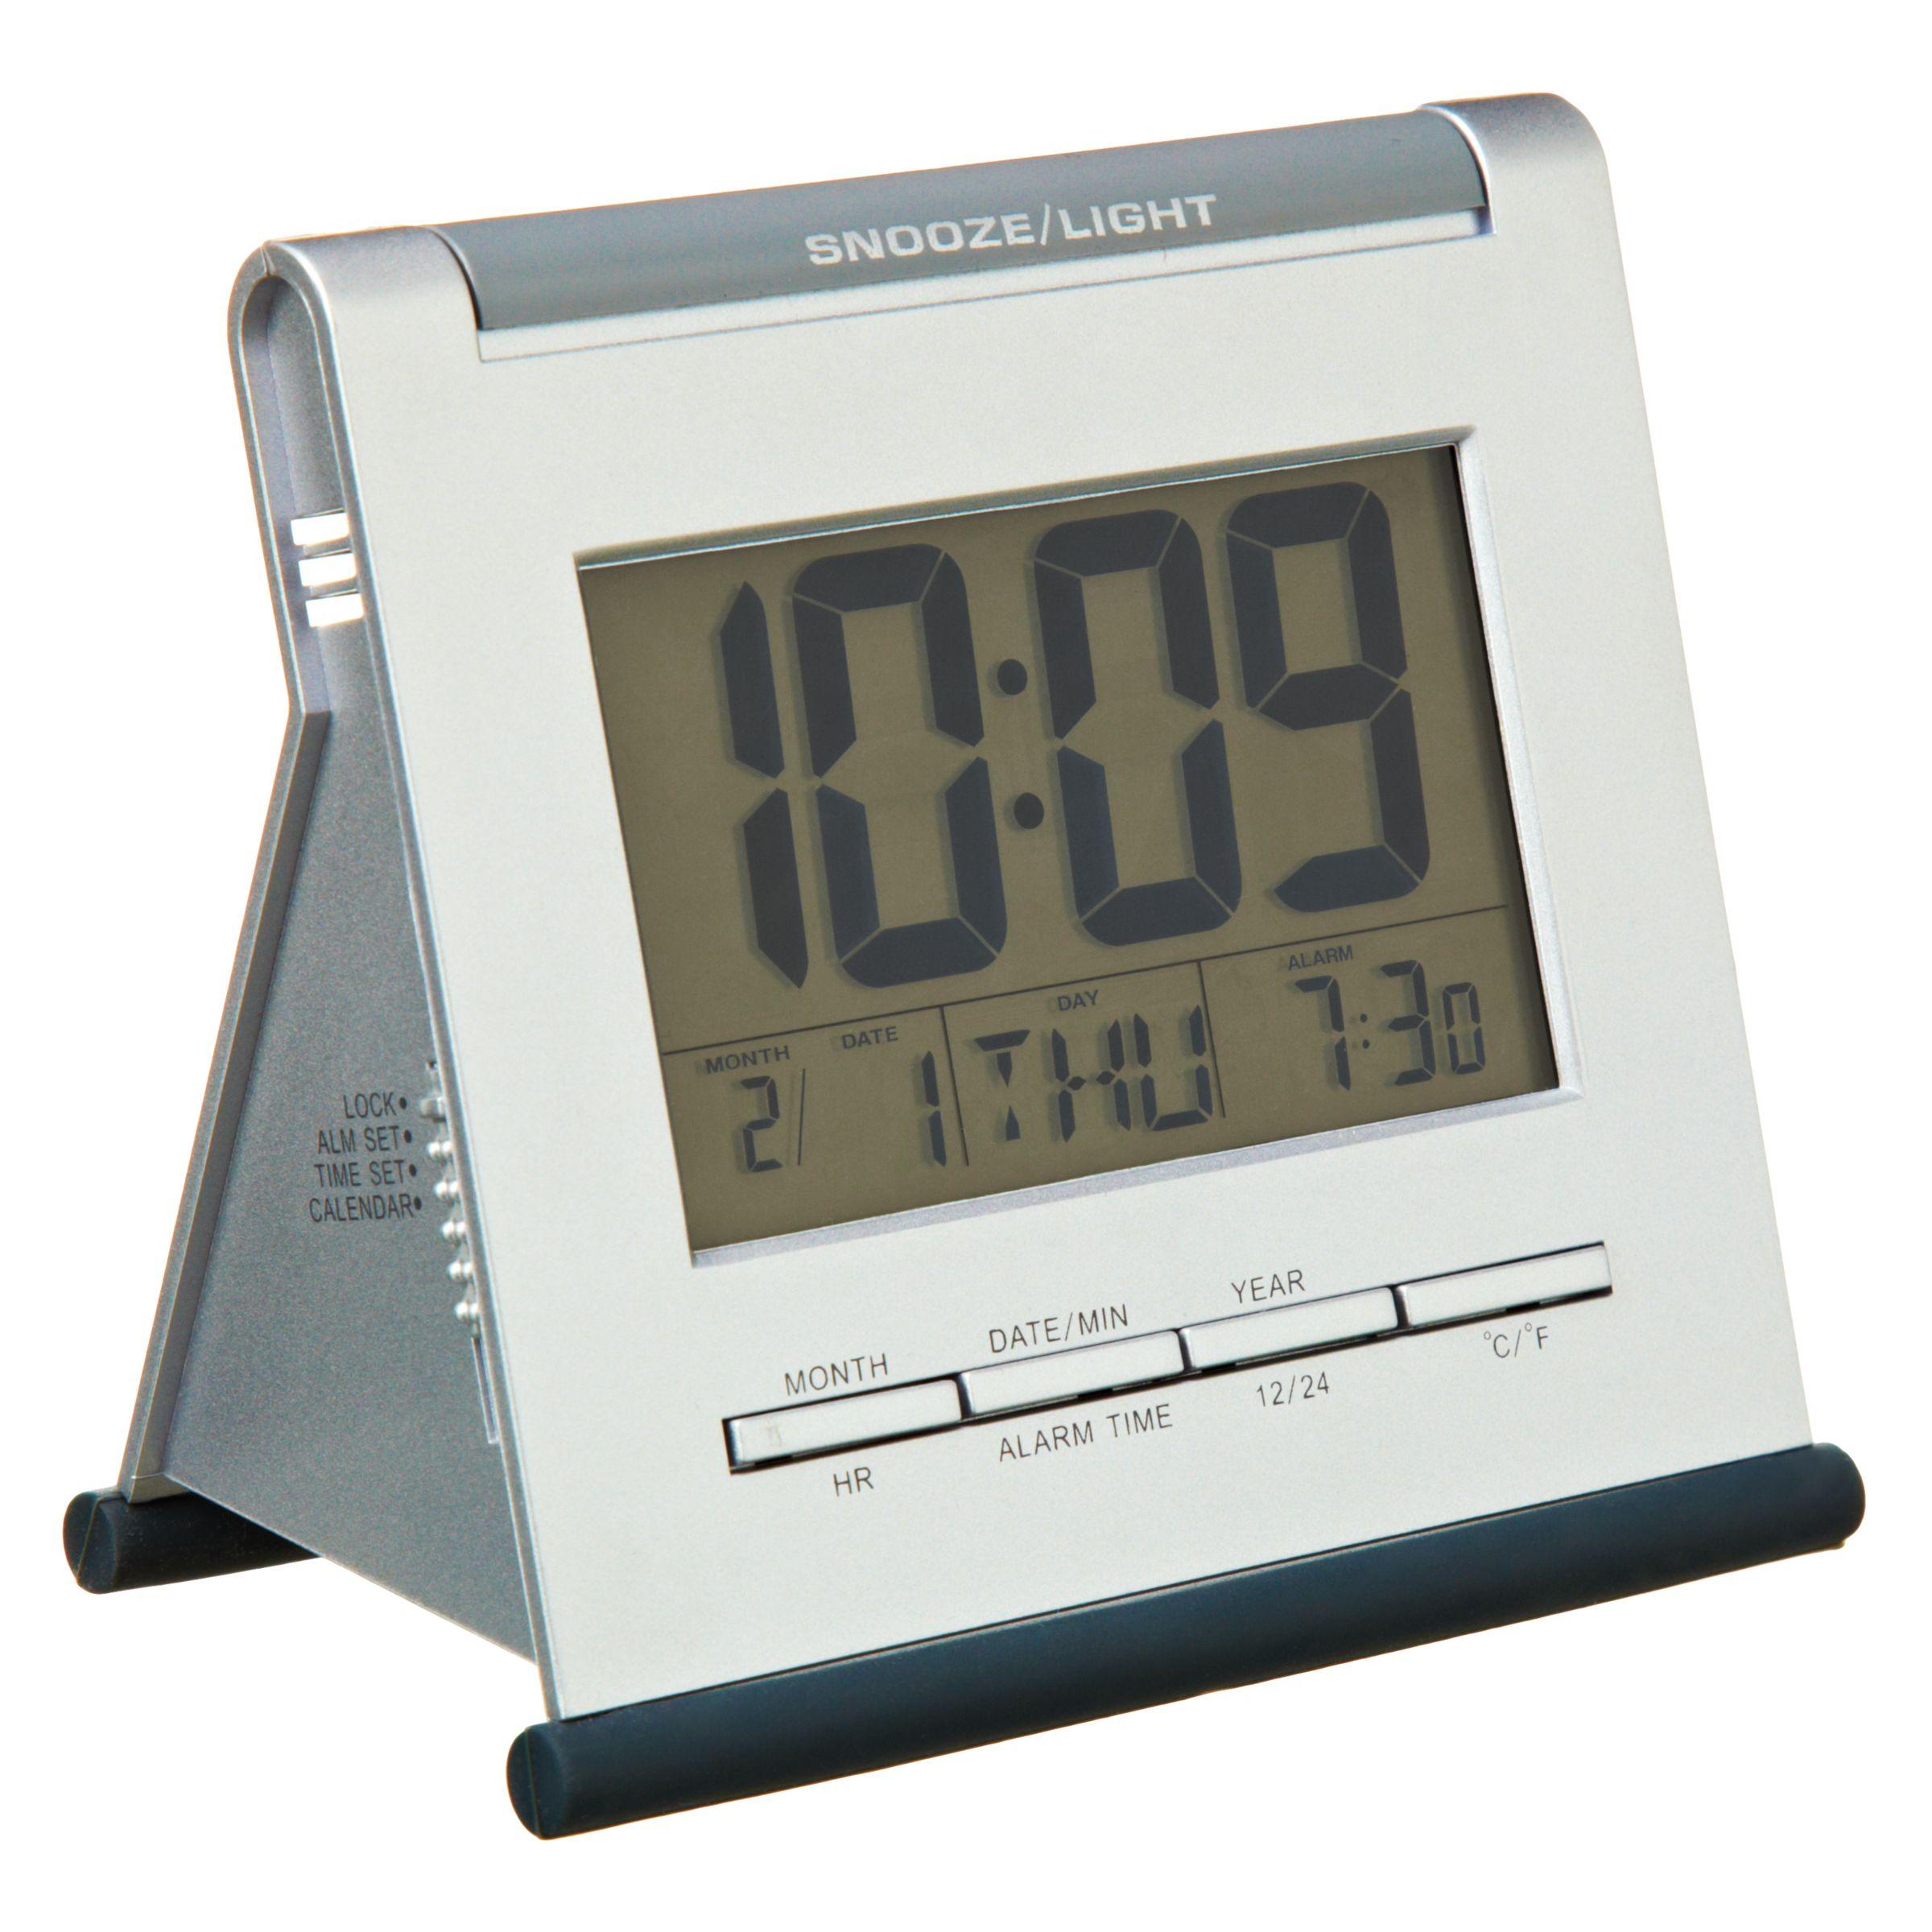 Acctim Apex Smartlite® LCD Digital Alarm Clock, Silver